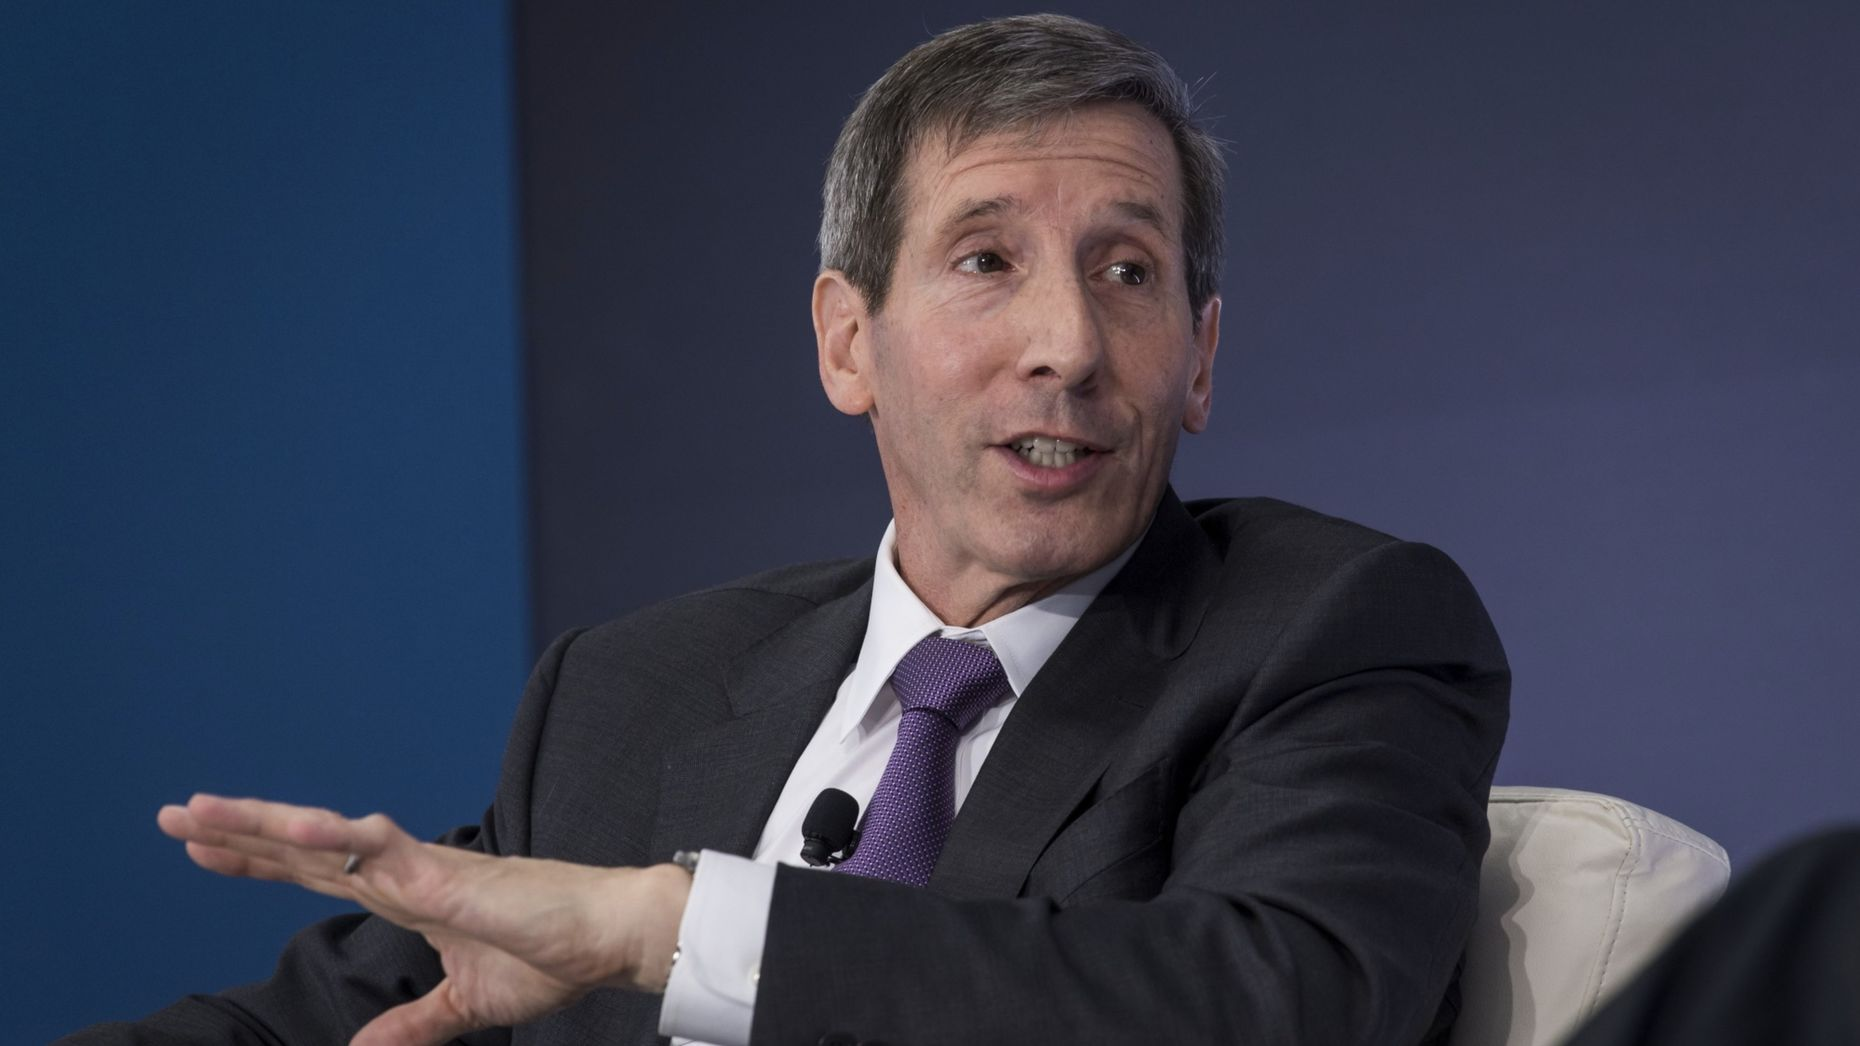 Flash News Analysis: FTC Antitrust Probe